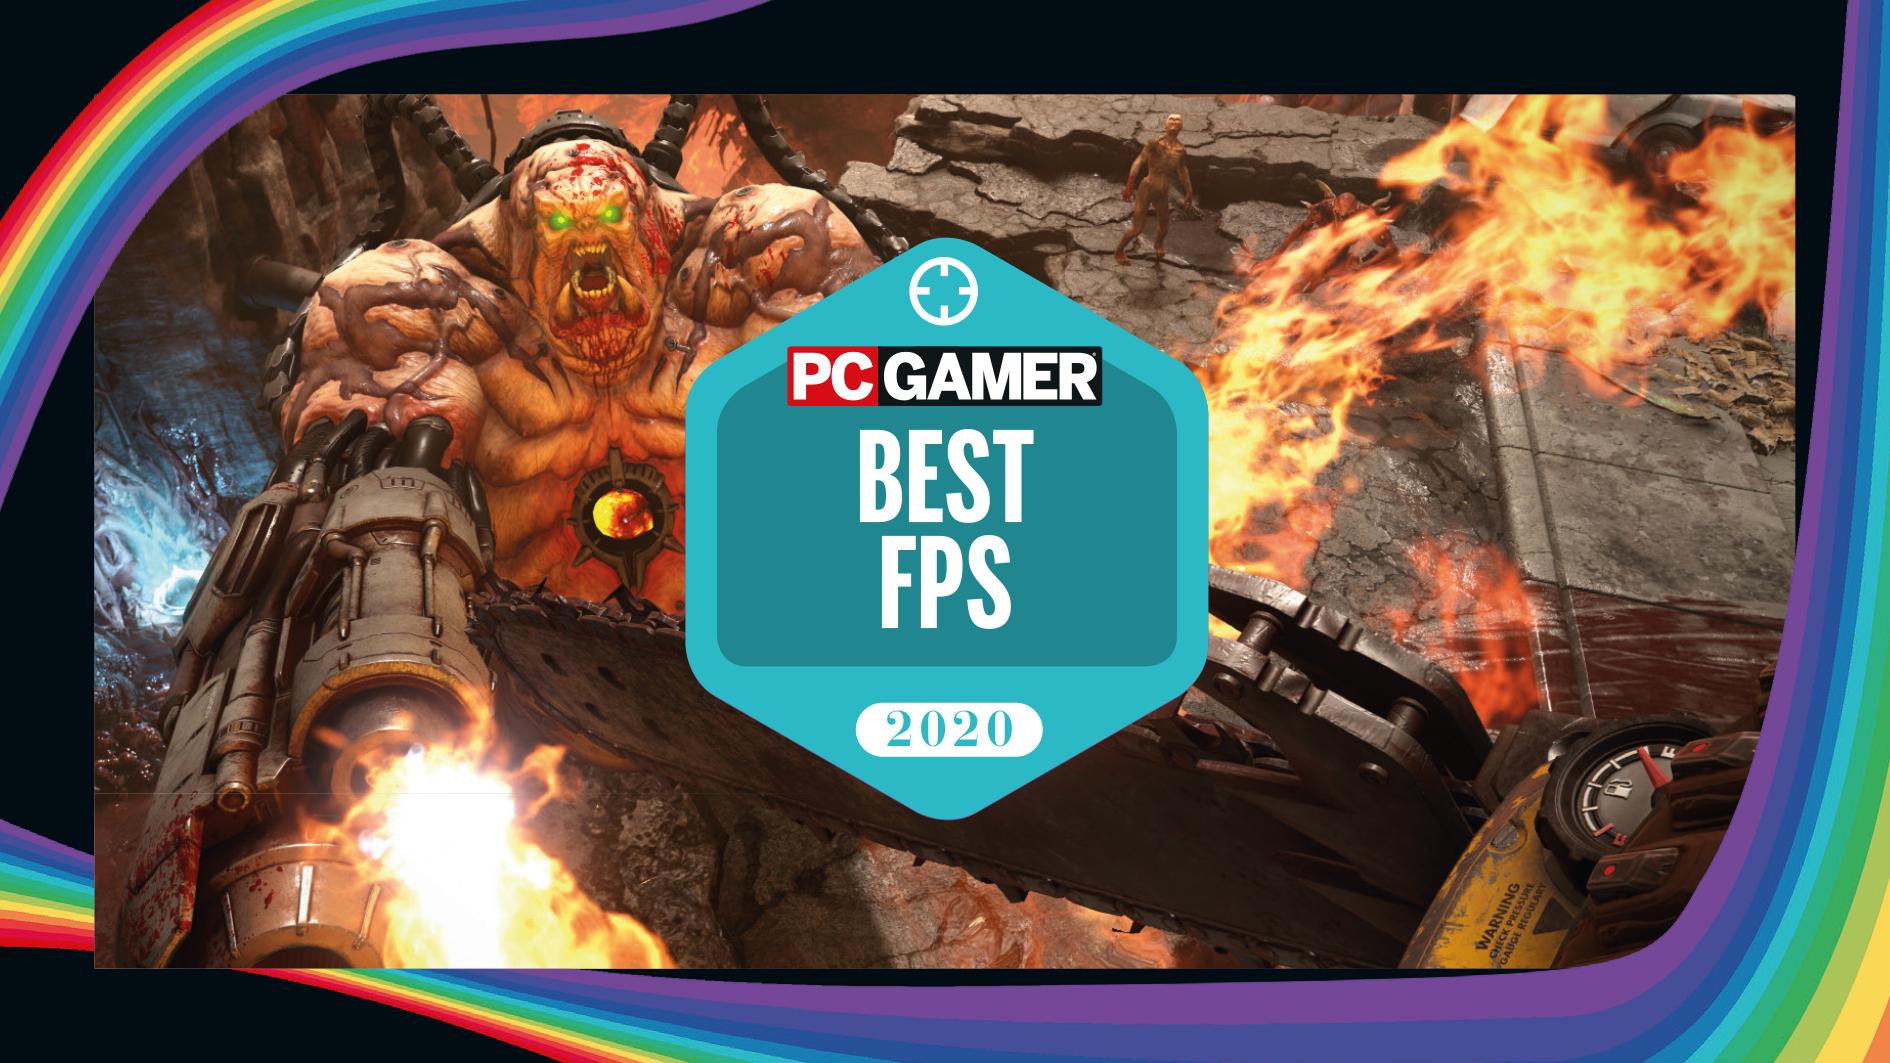 Best FPS 2020: Doom Eternal